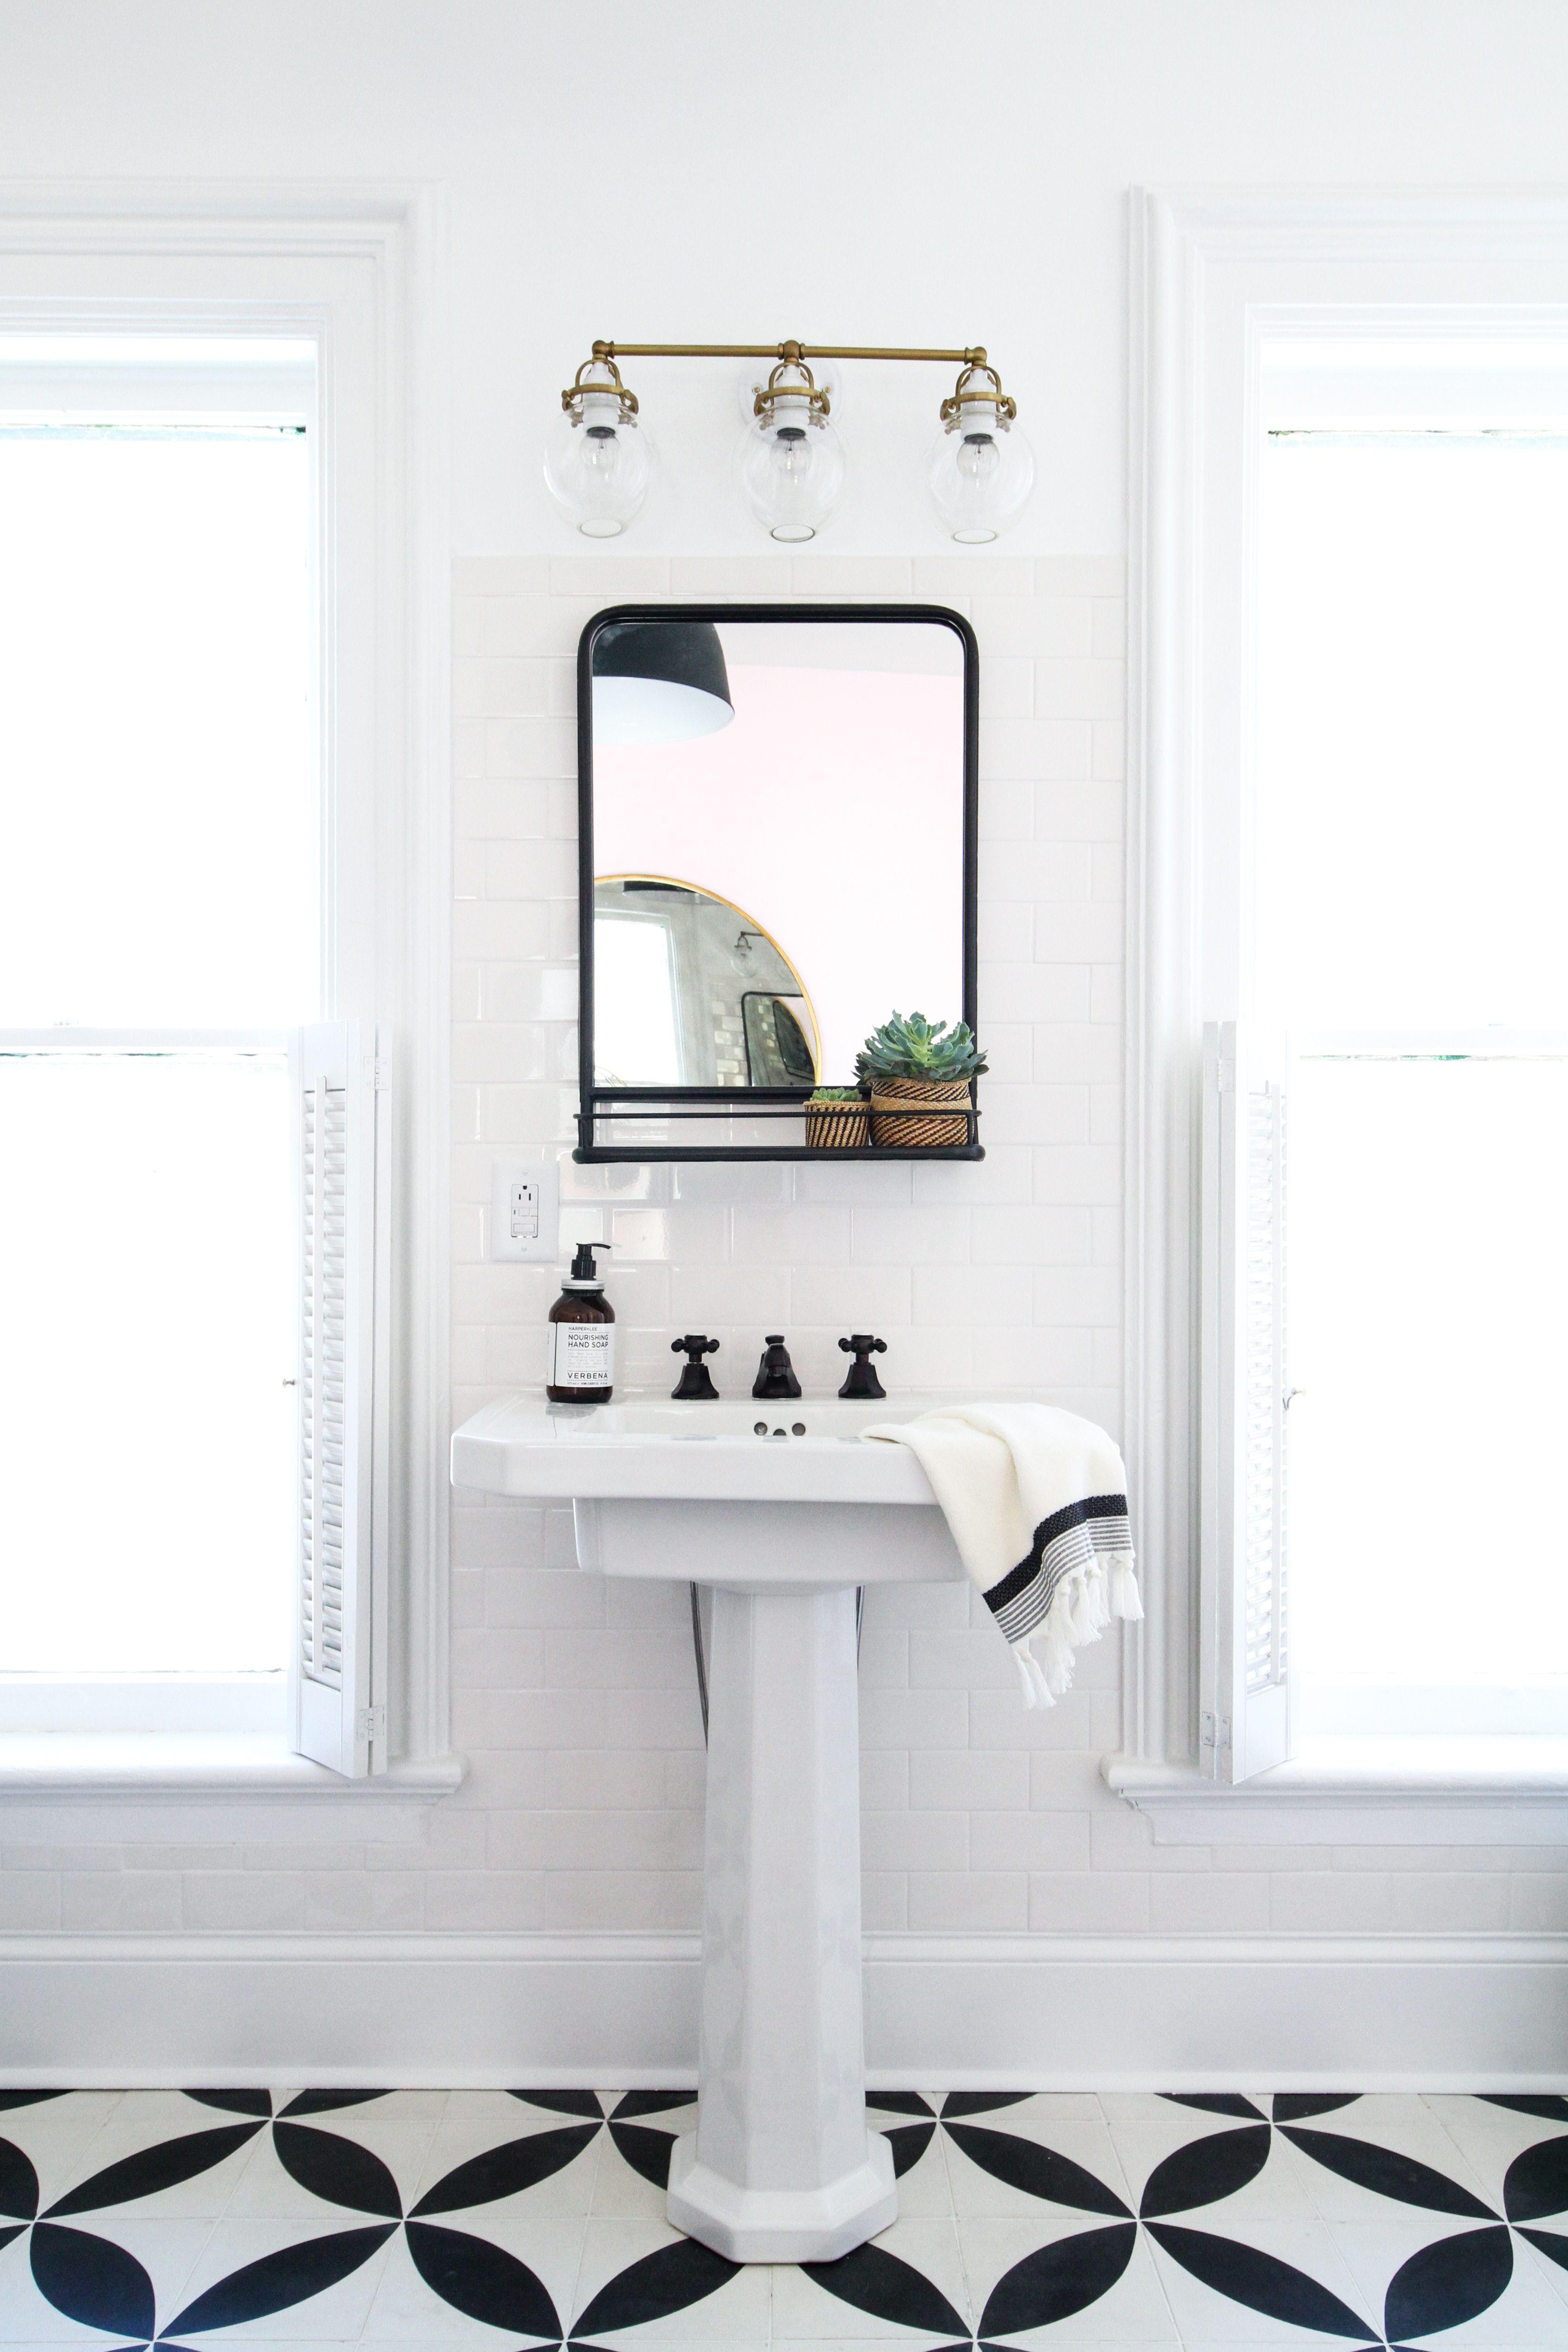 How To Hang A Bathroom Mirror On Ceramic Tile Bathroom Mirrors